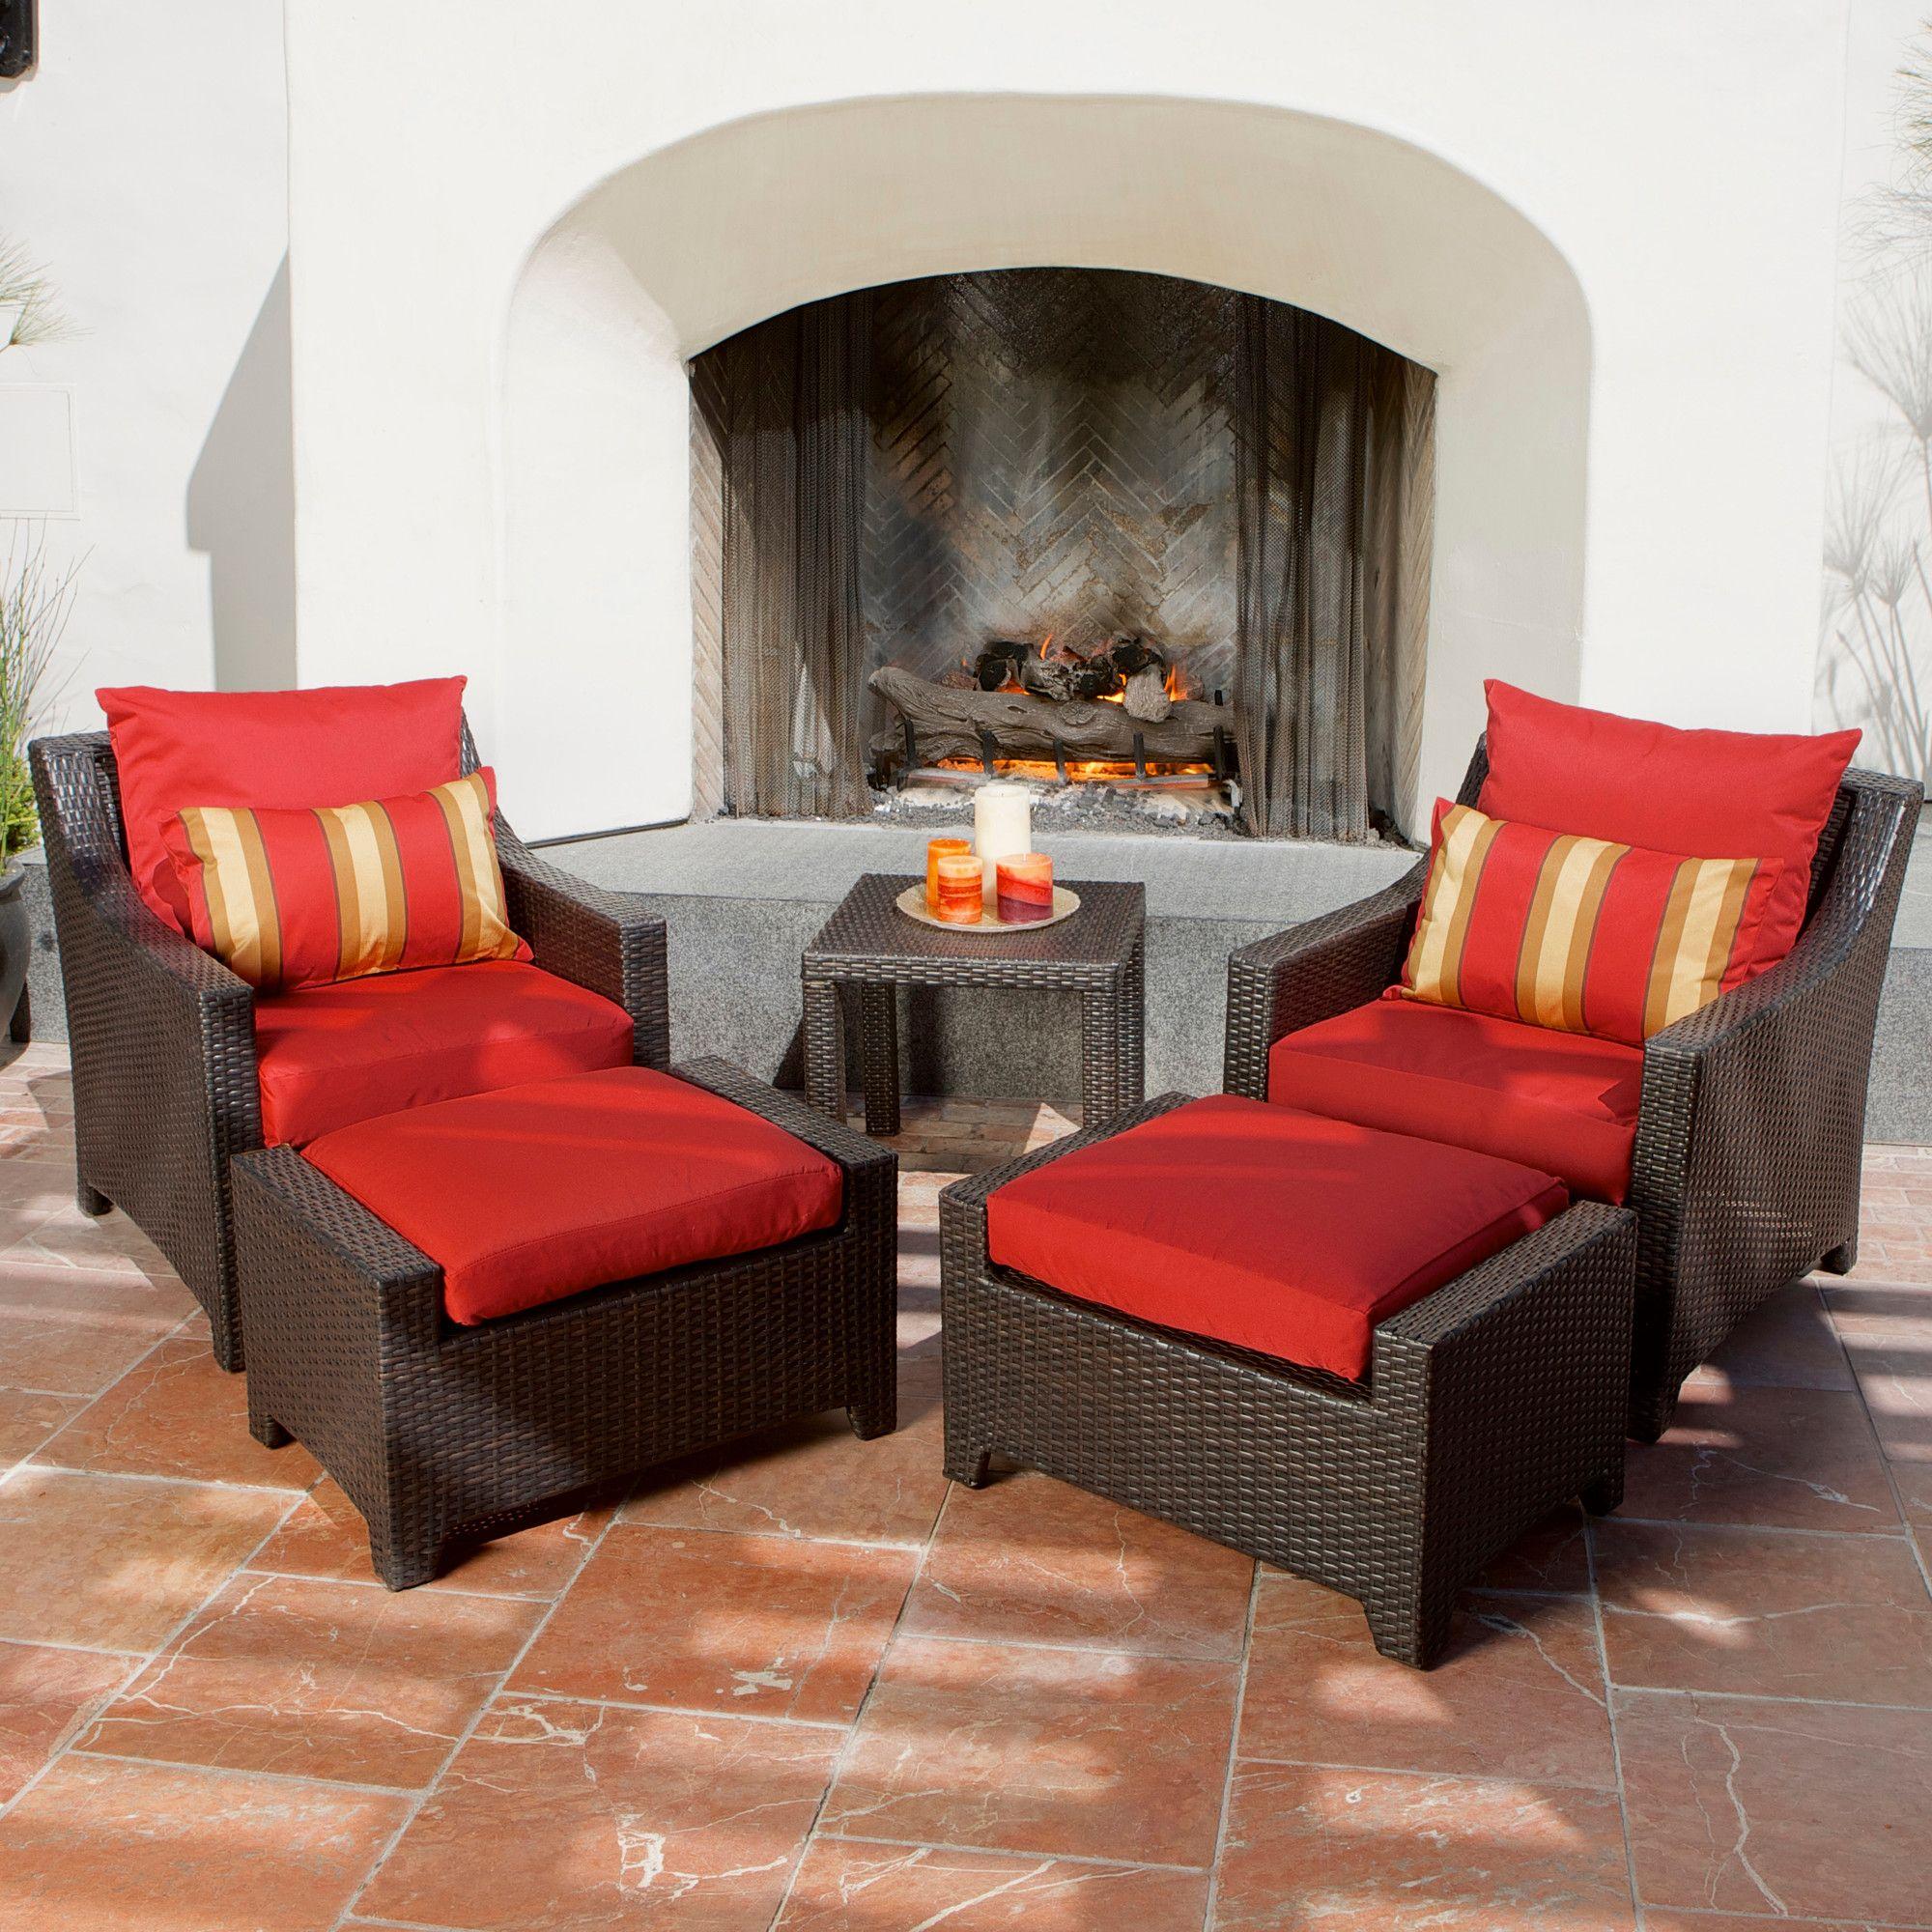 Northridge 5 Piece Conversation Set With Cushions Chair Ottoman Set Chair Ottoman Outdoor Furniture Sets